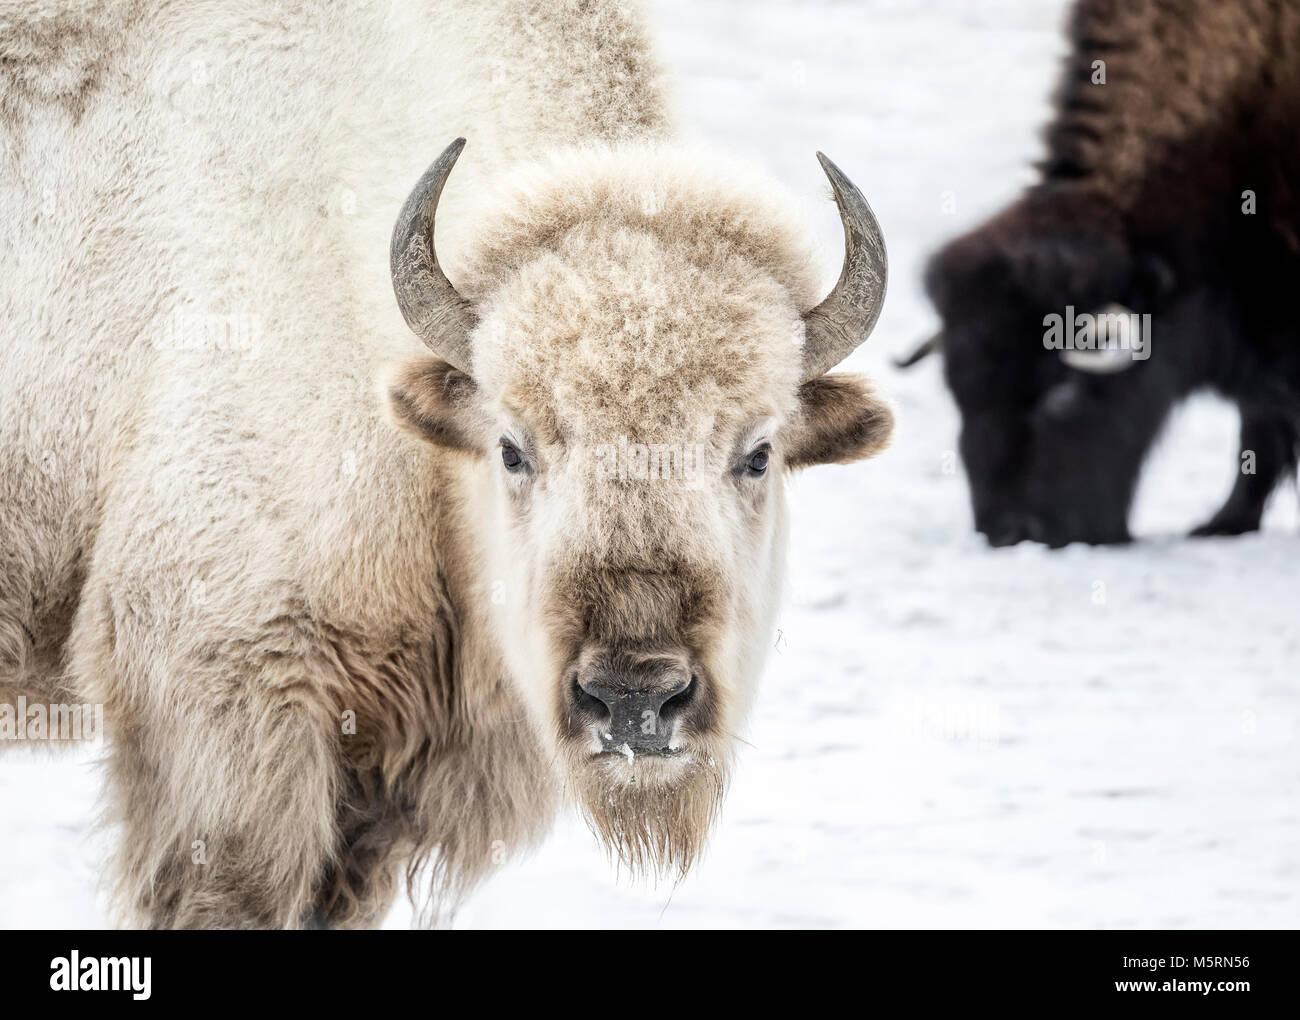 Sacred White Bison, Manitoba, Canada. - Stock Image